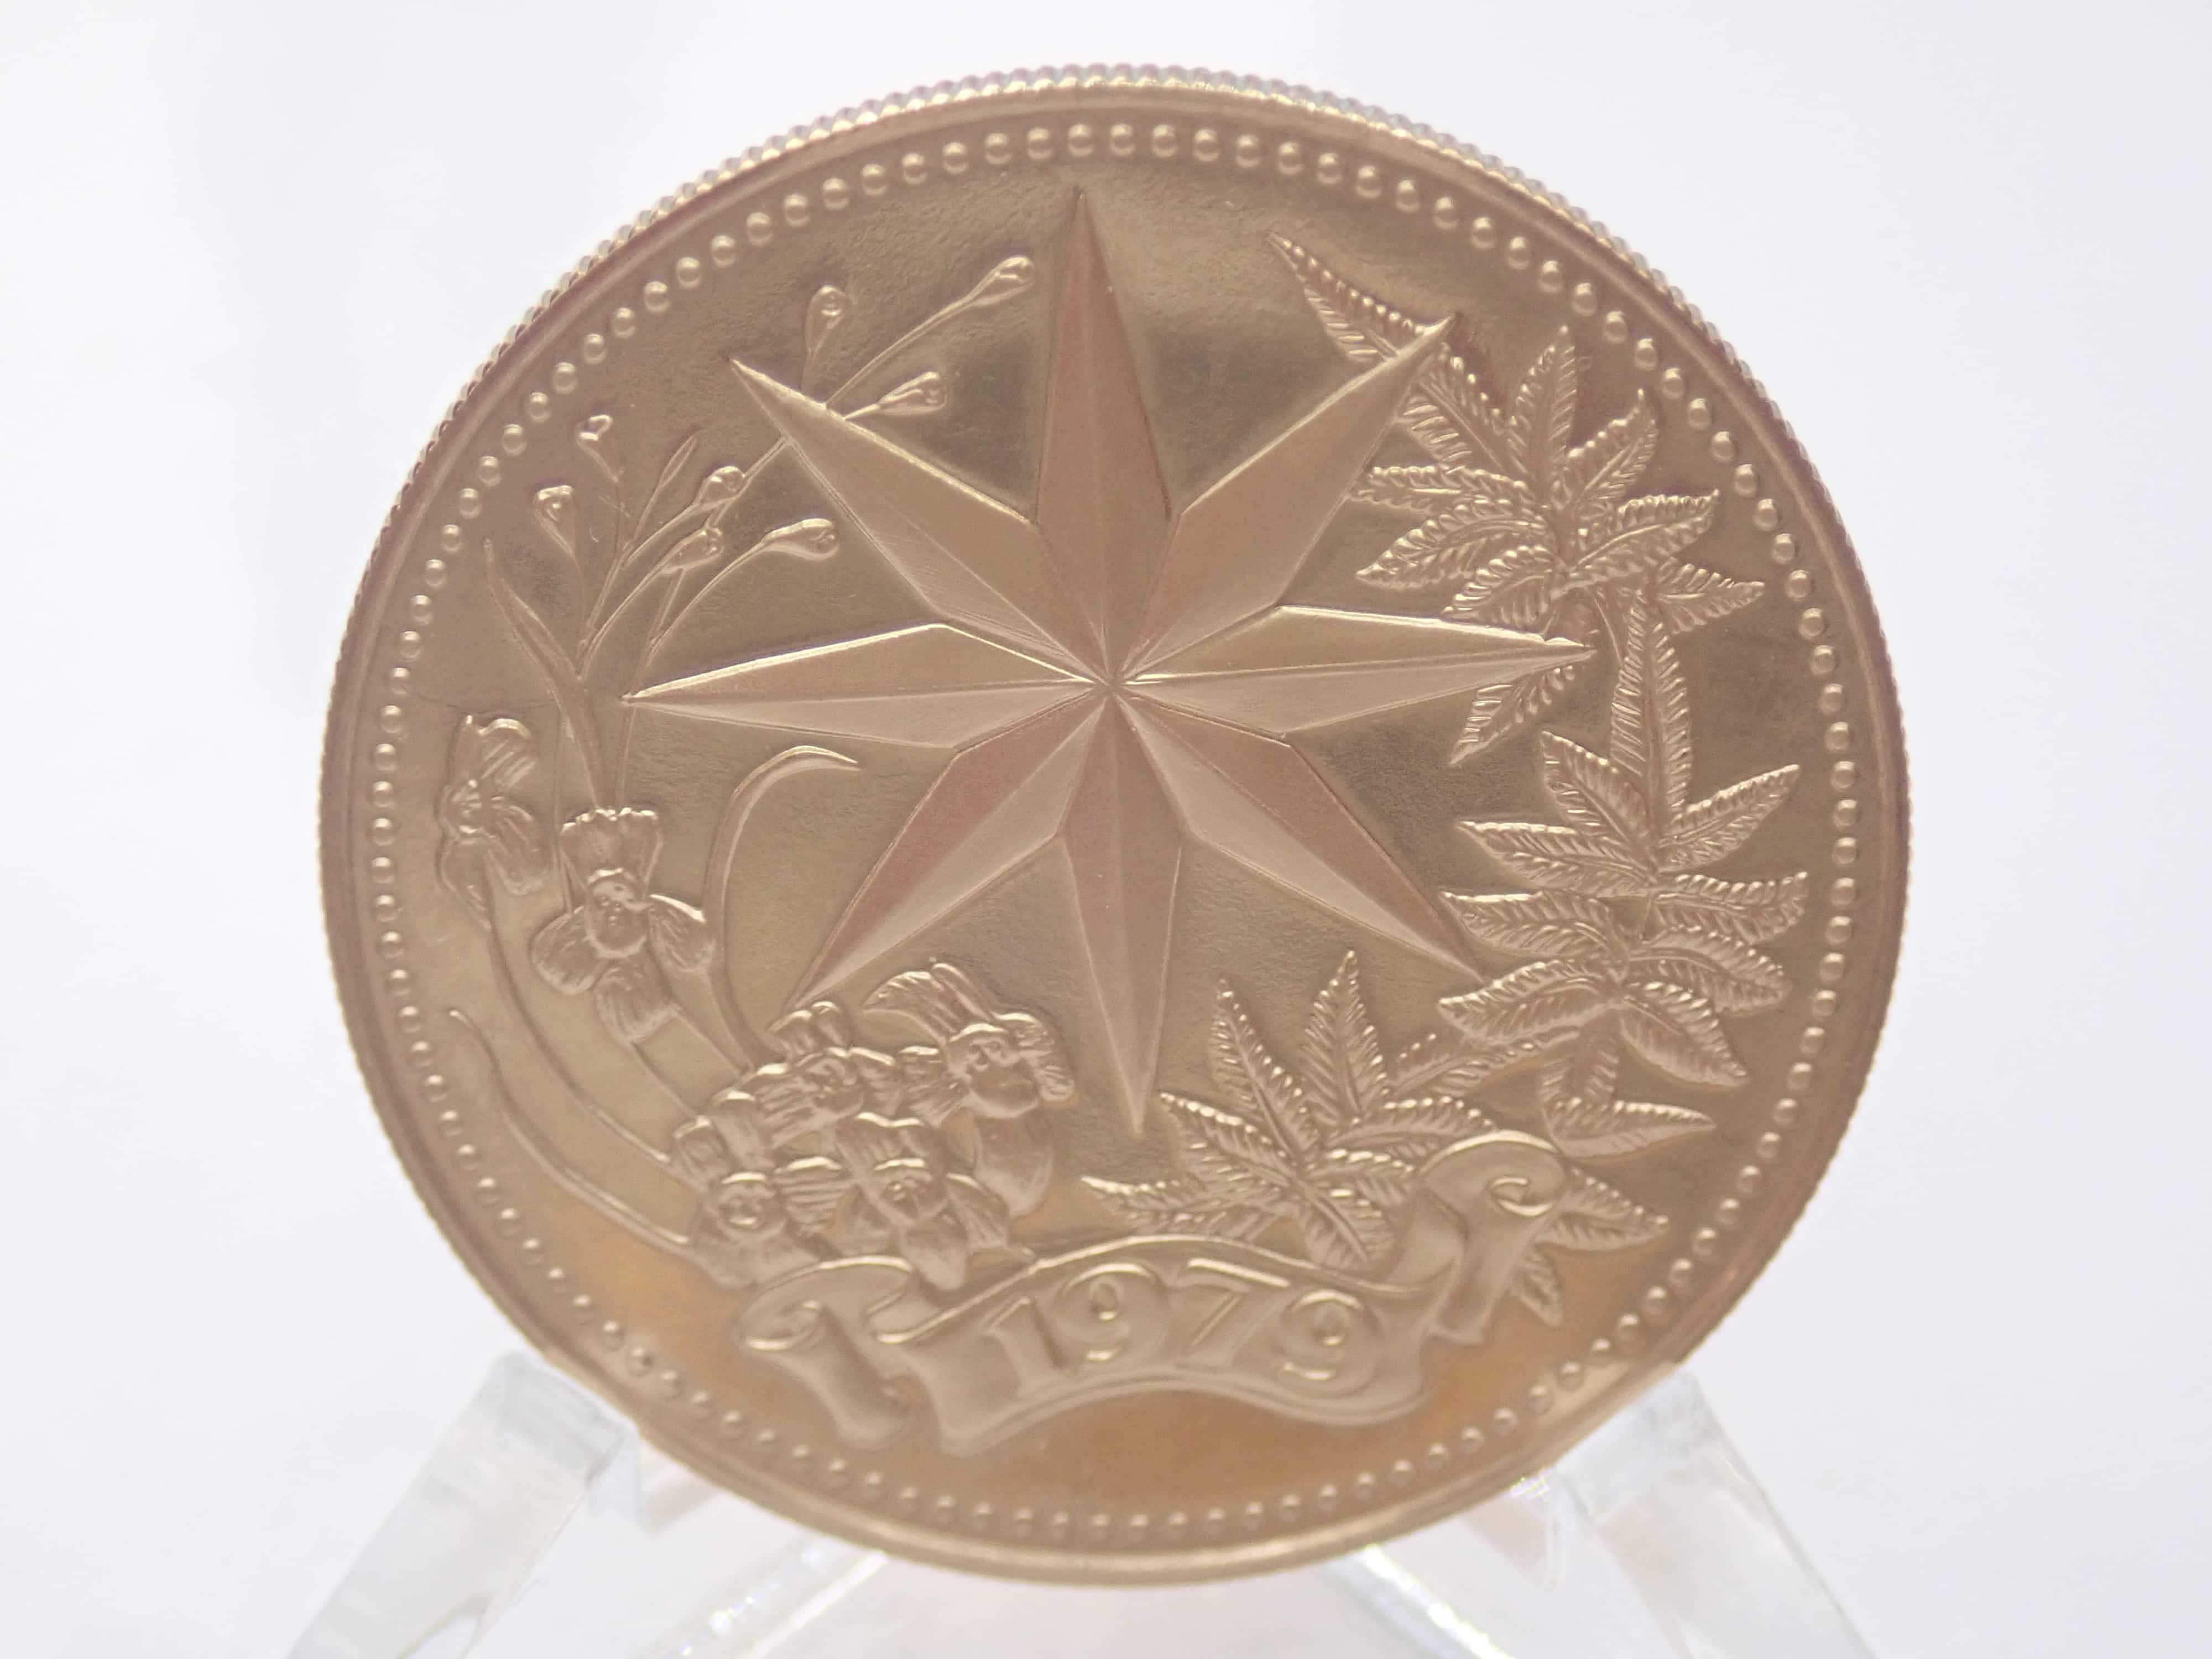 AZZ00815 - 1979 Gold Belize Mint $100 Star Bethlehem 6.21grams 12ct Gold